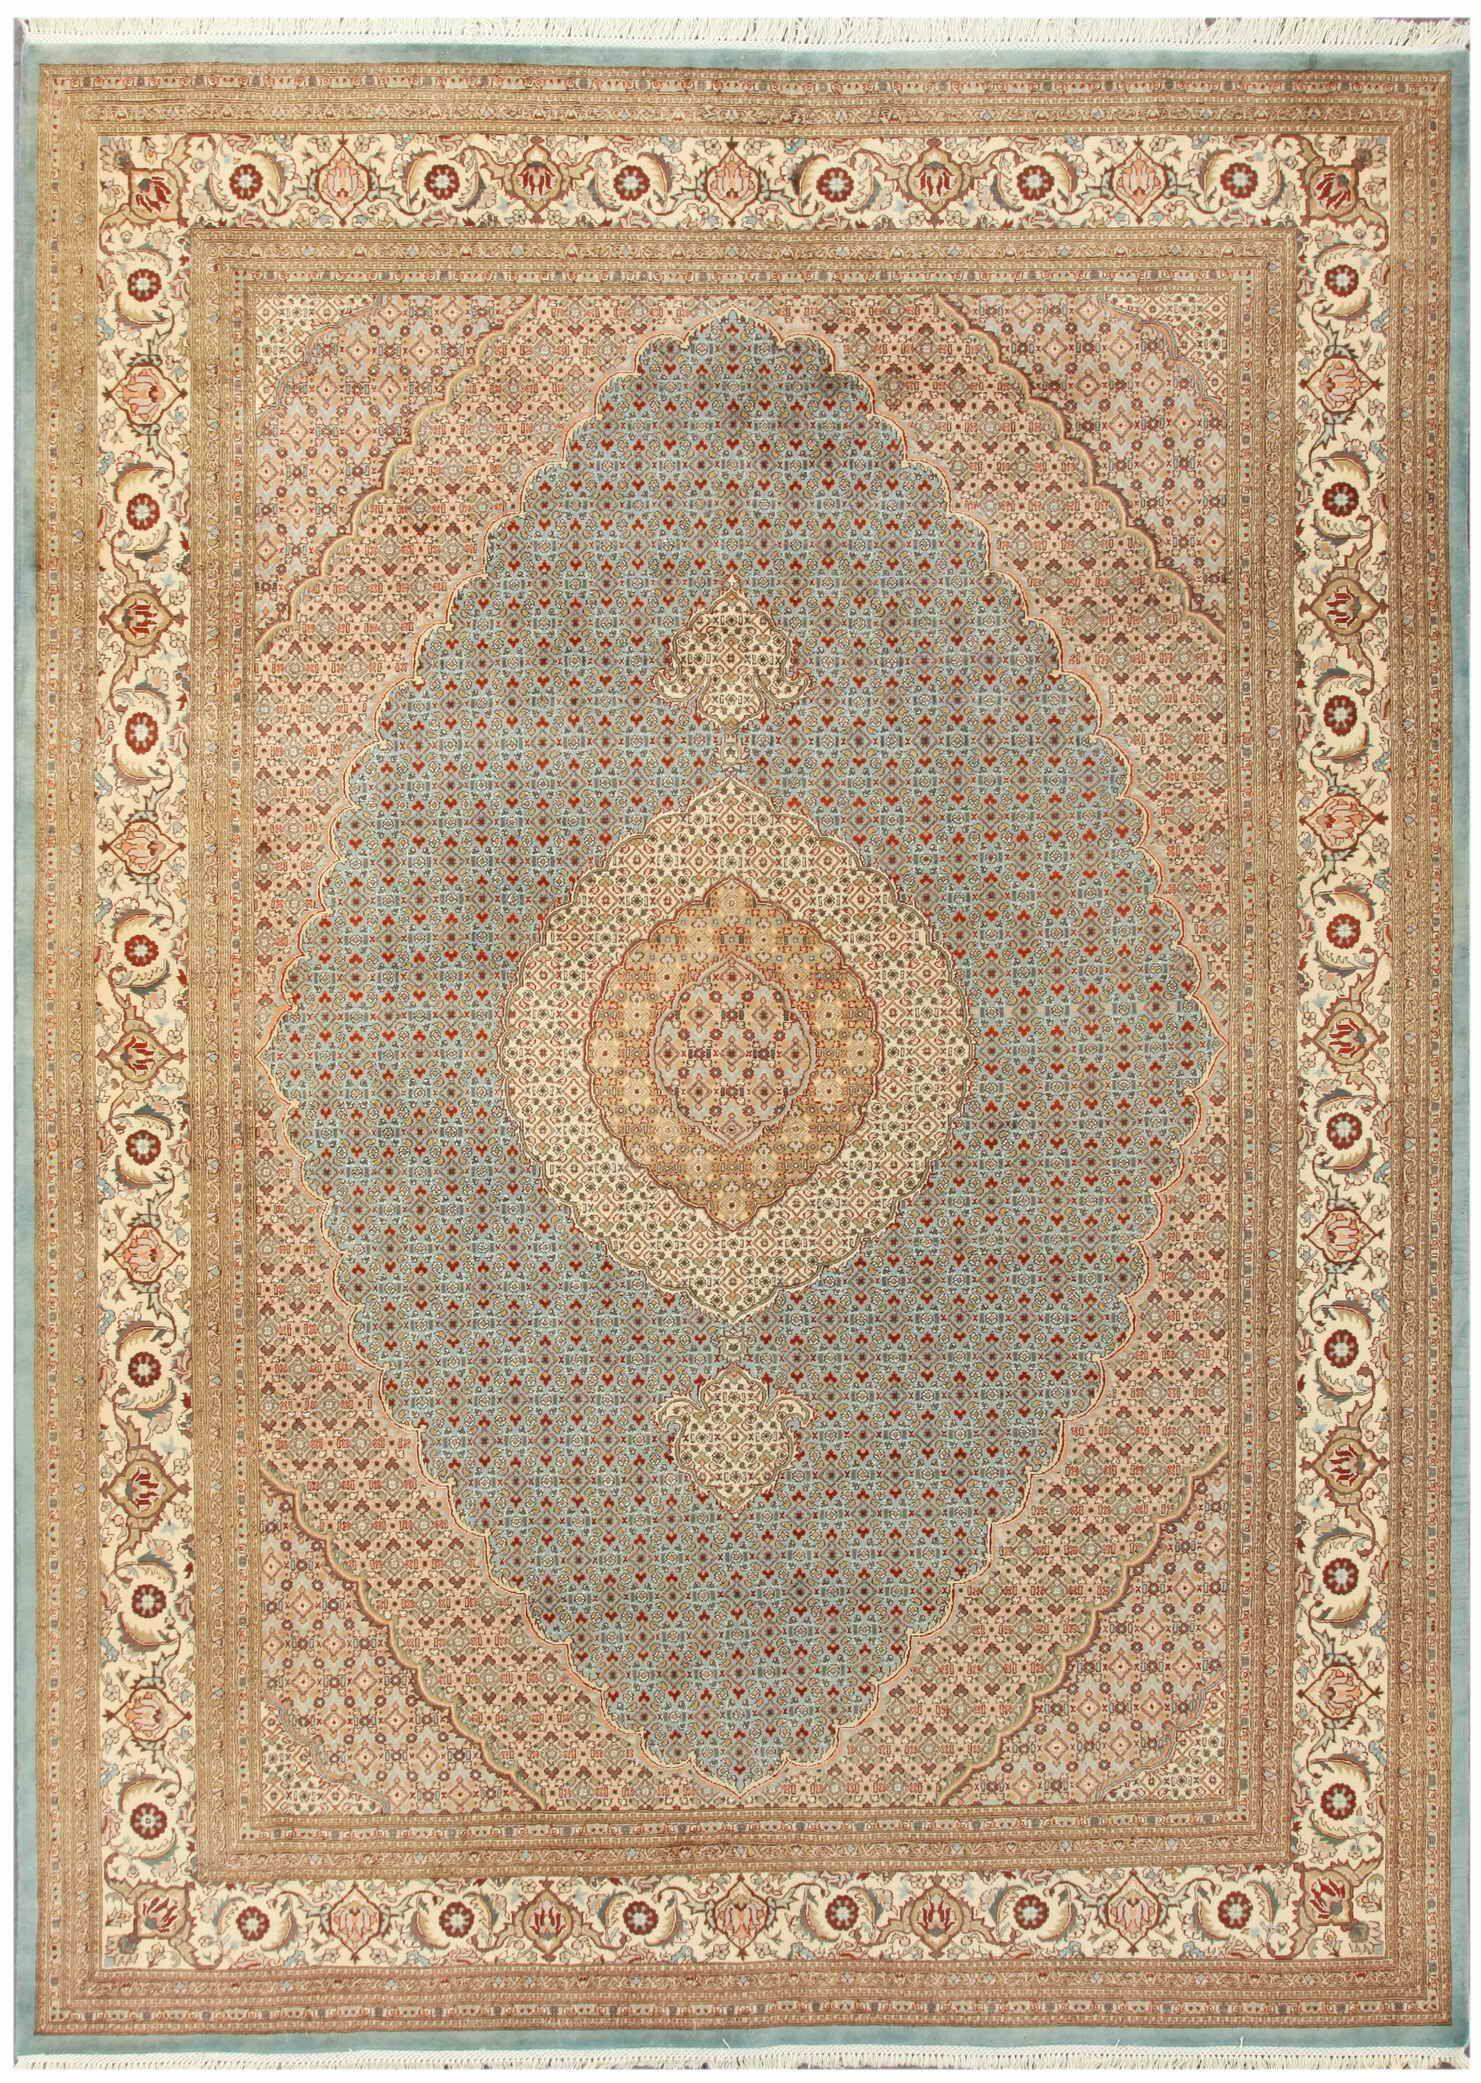 Tabriz Hand-Knotted Light Blue/Ivory Area Rug